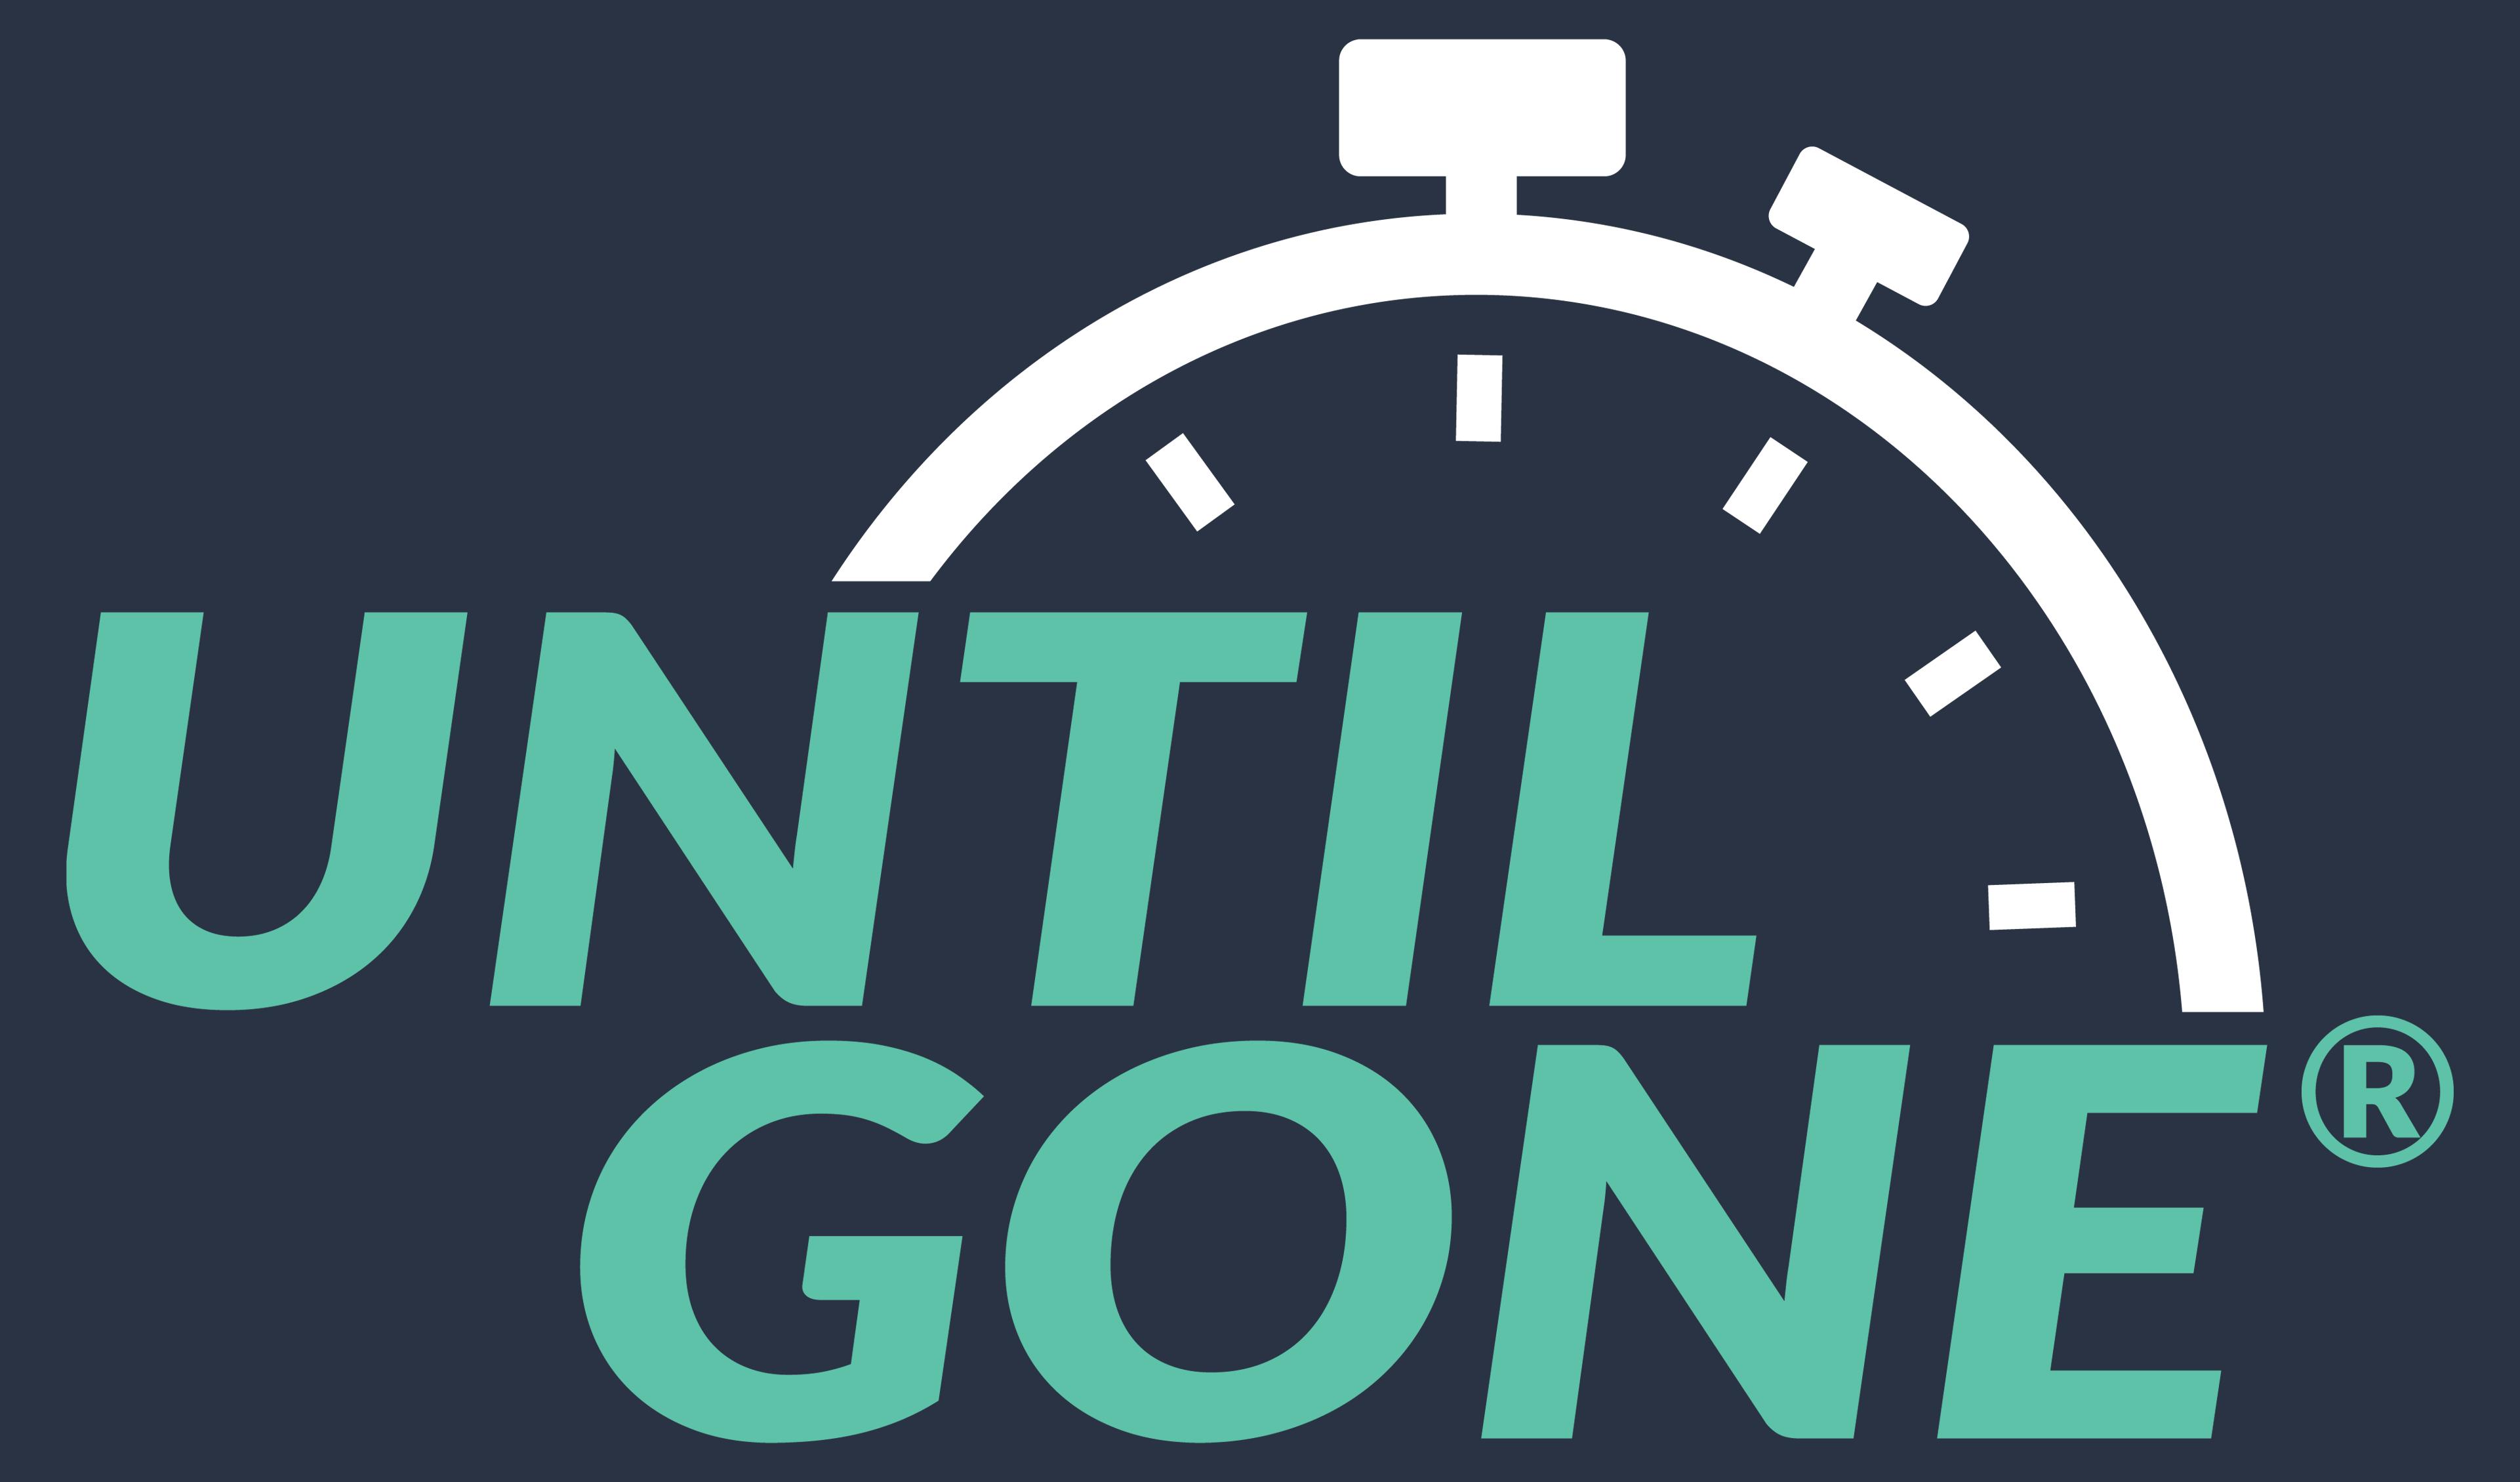 UntilGone.com